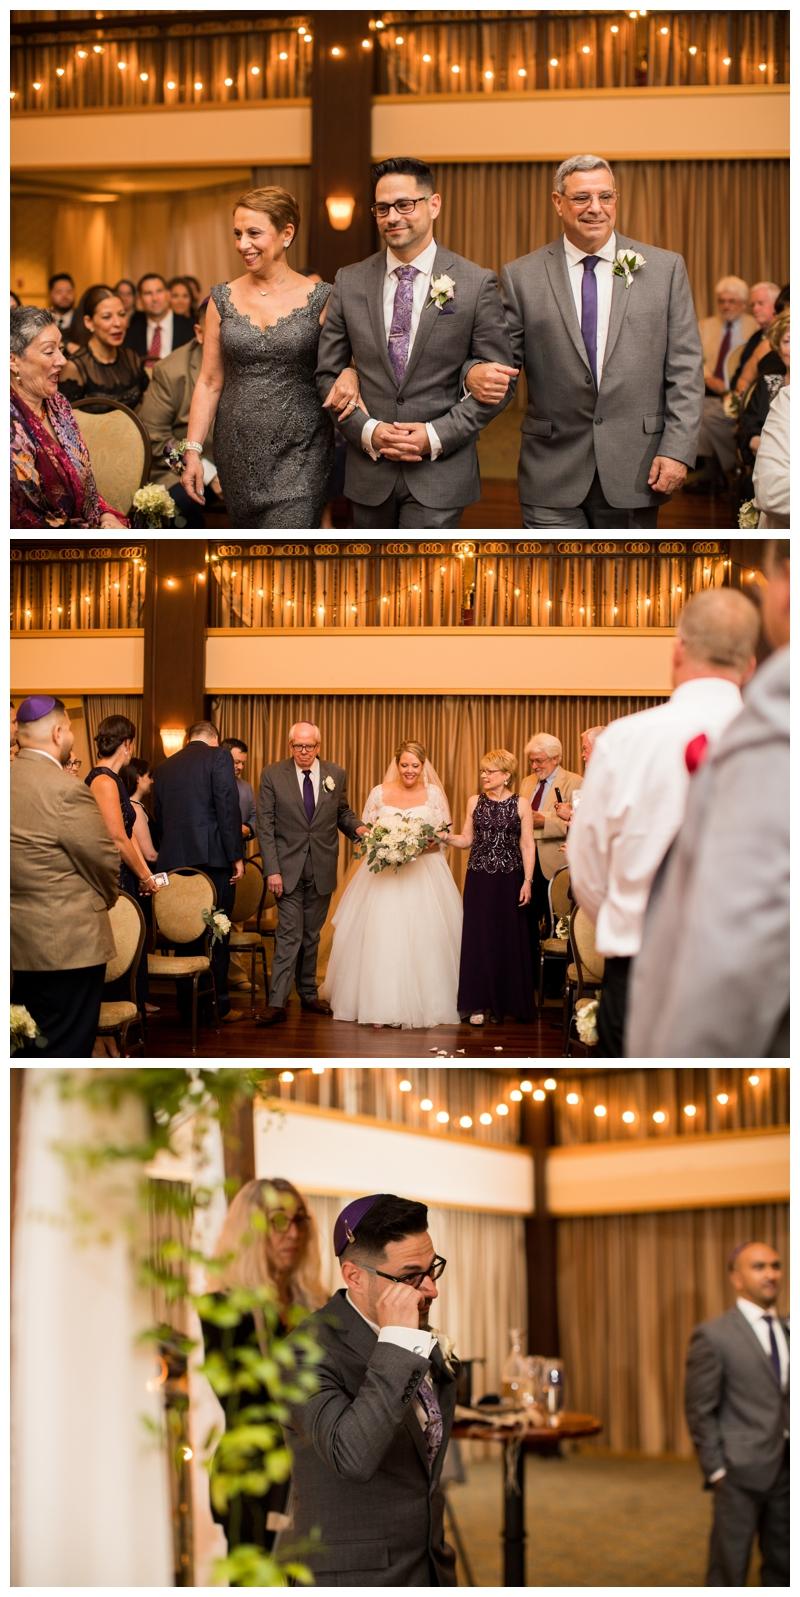 collingswood-grand-ballroom-wedding-17